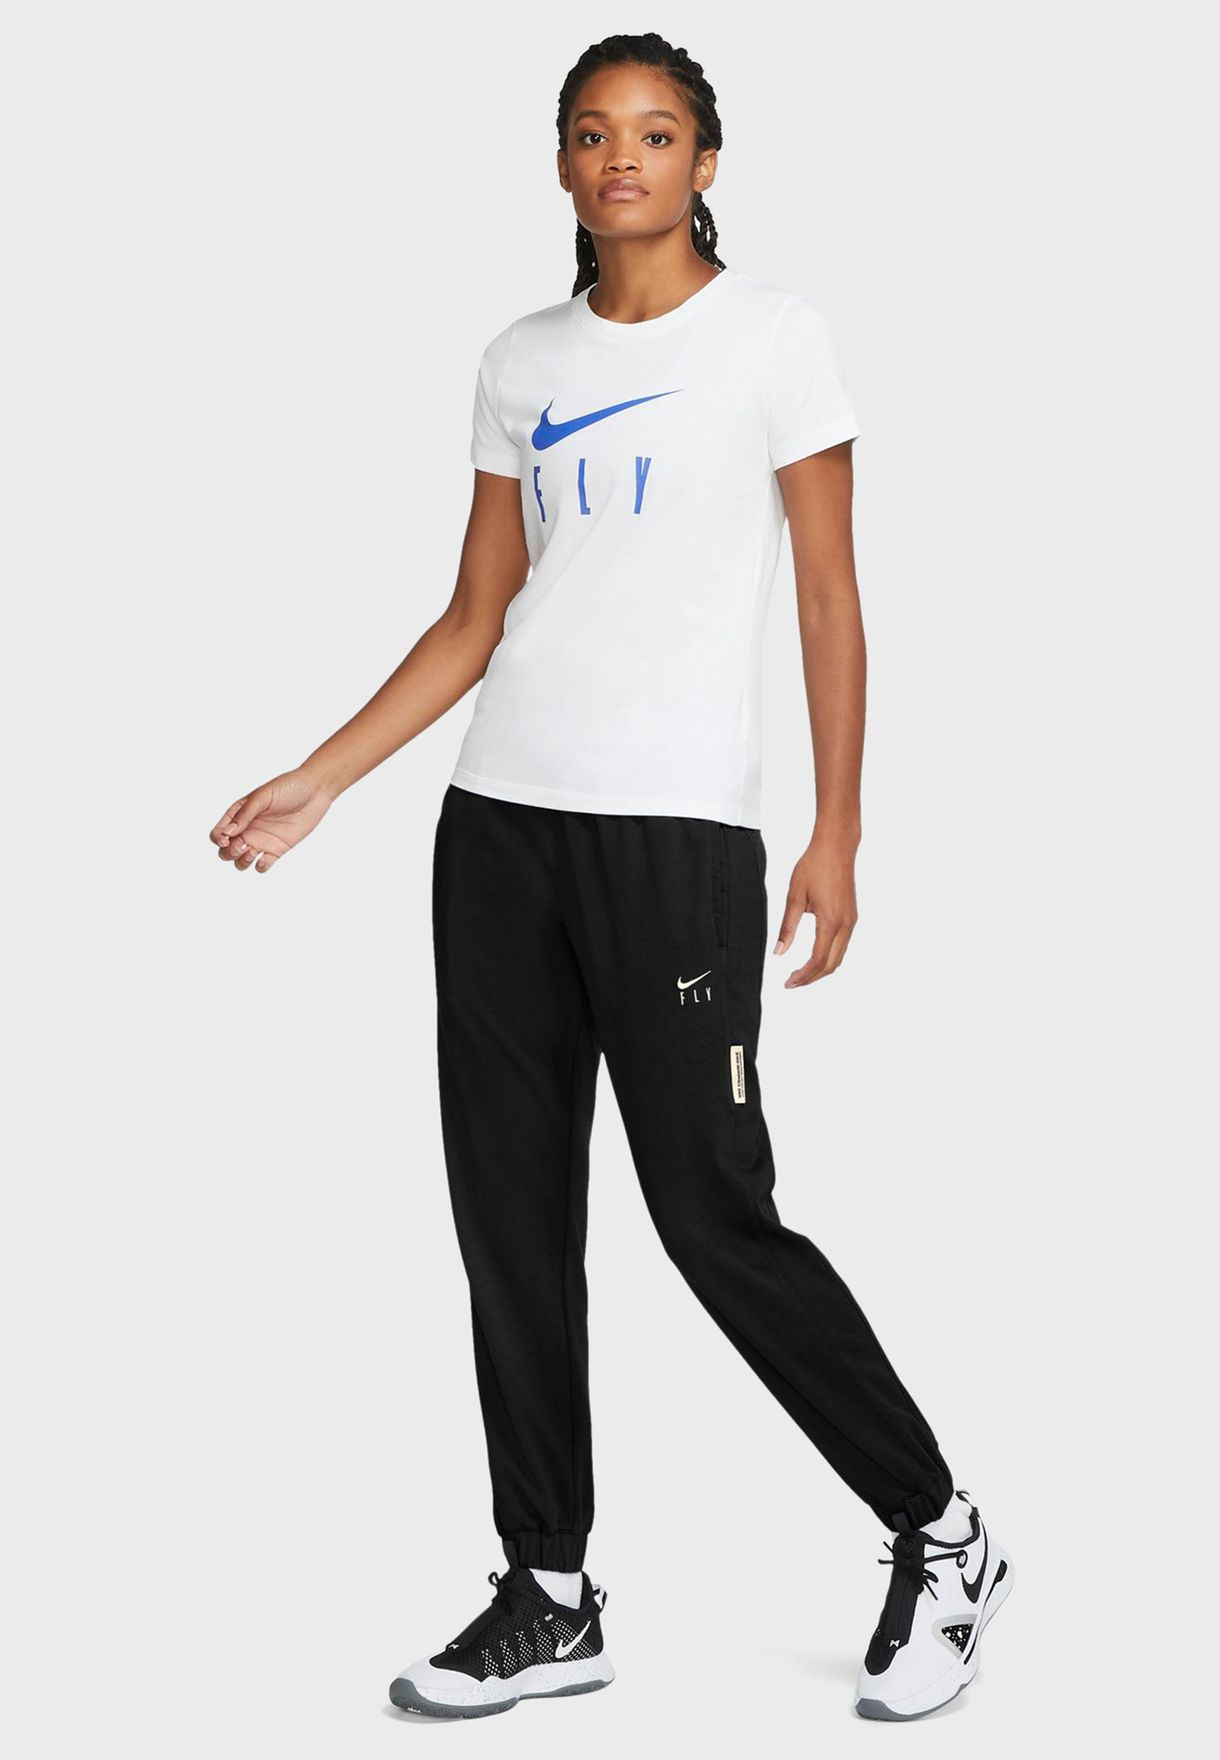 Standard Issue Sweatpants